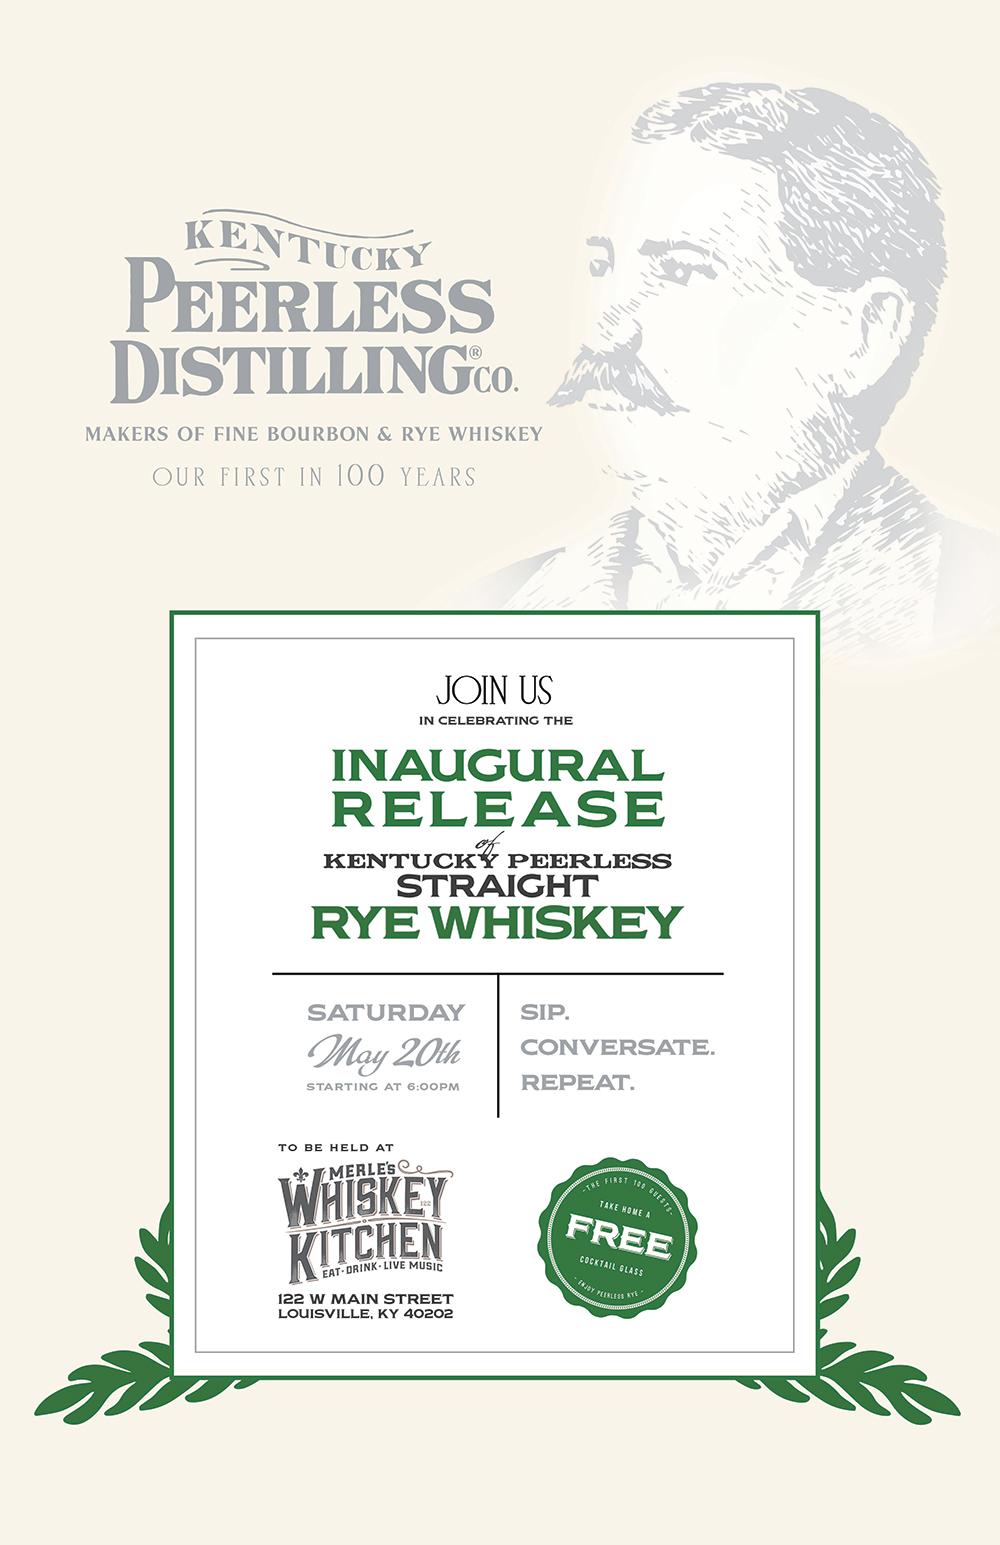 Merles-Whiskey-Kitchen - Peerless Distilling Co.